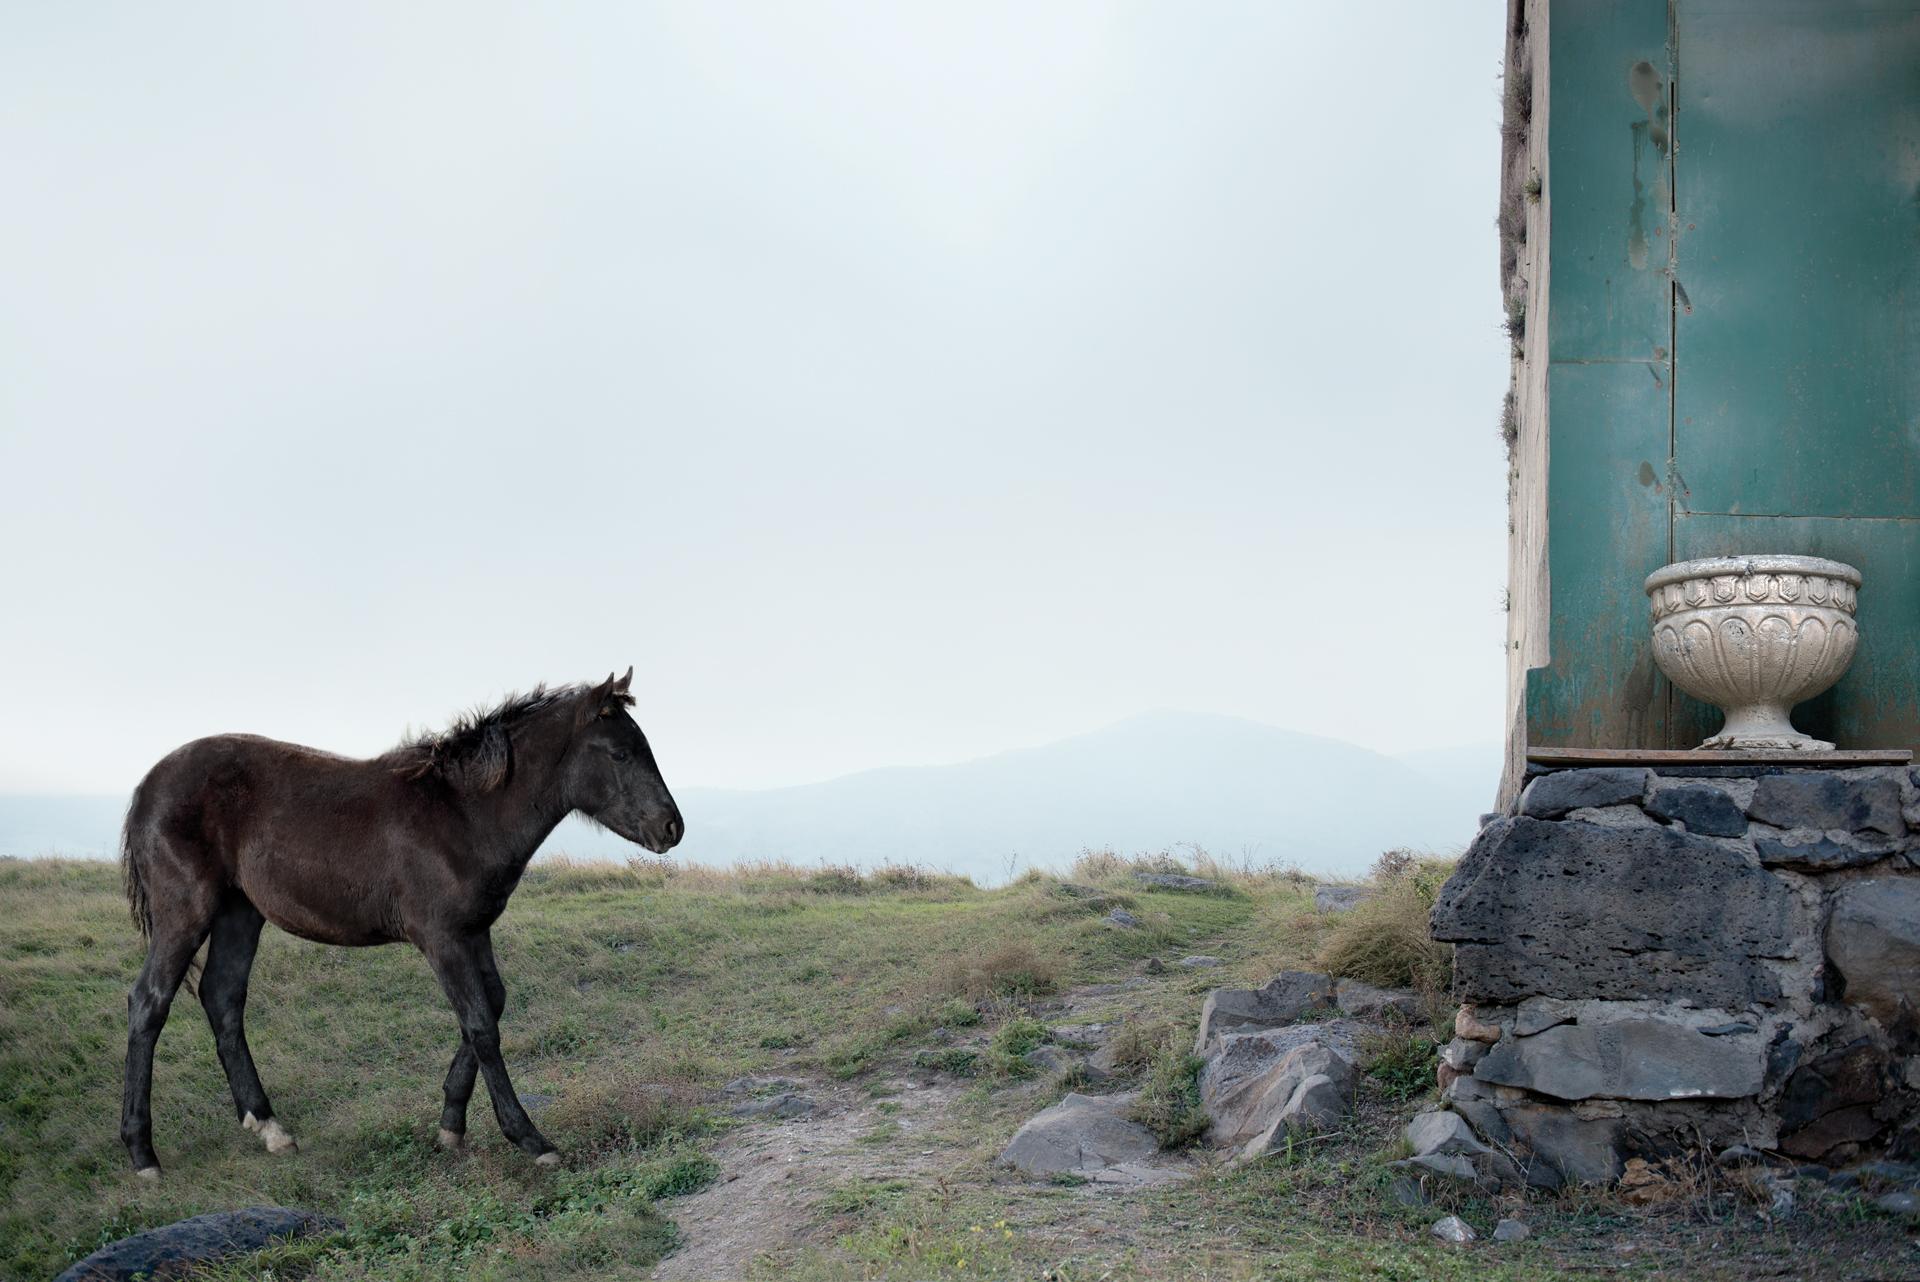 Journey To Armenia, Silvia Camporesi . Courtesy galleria Photographica fine art Lugano